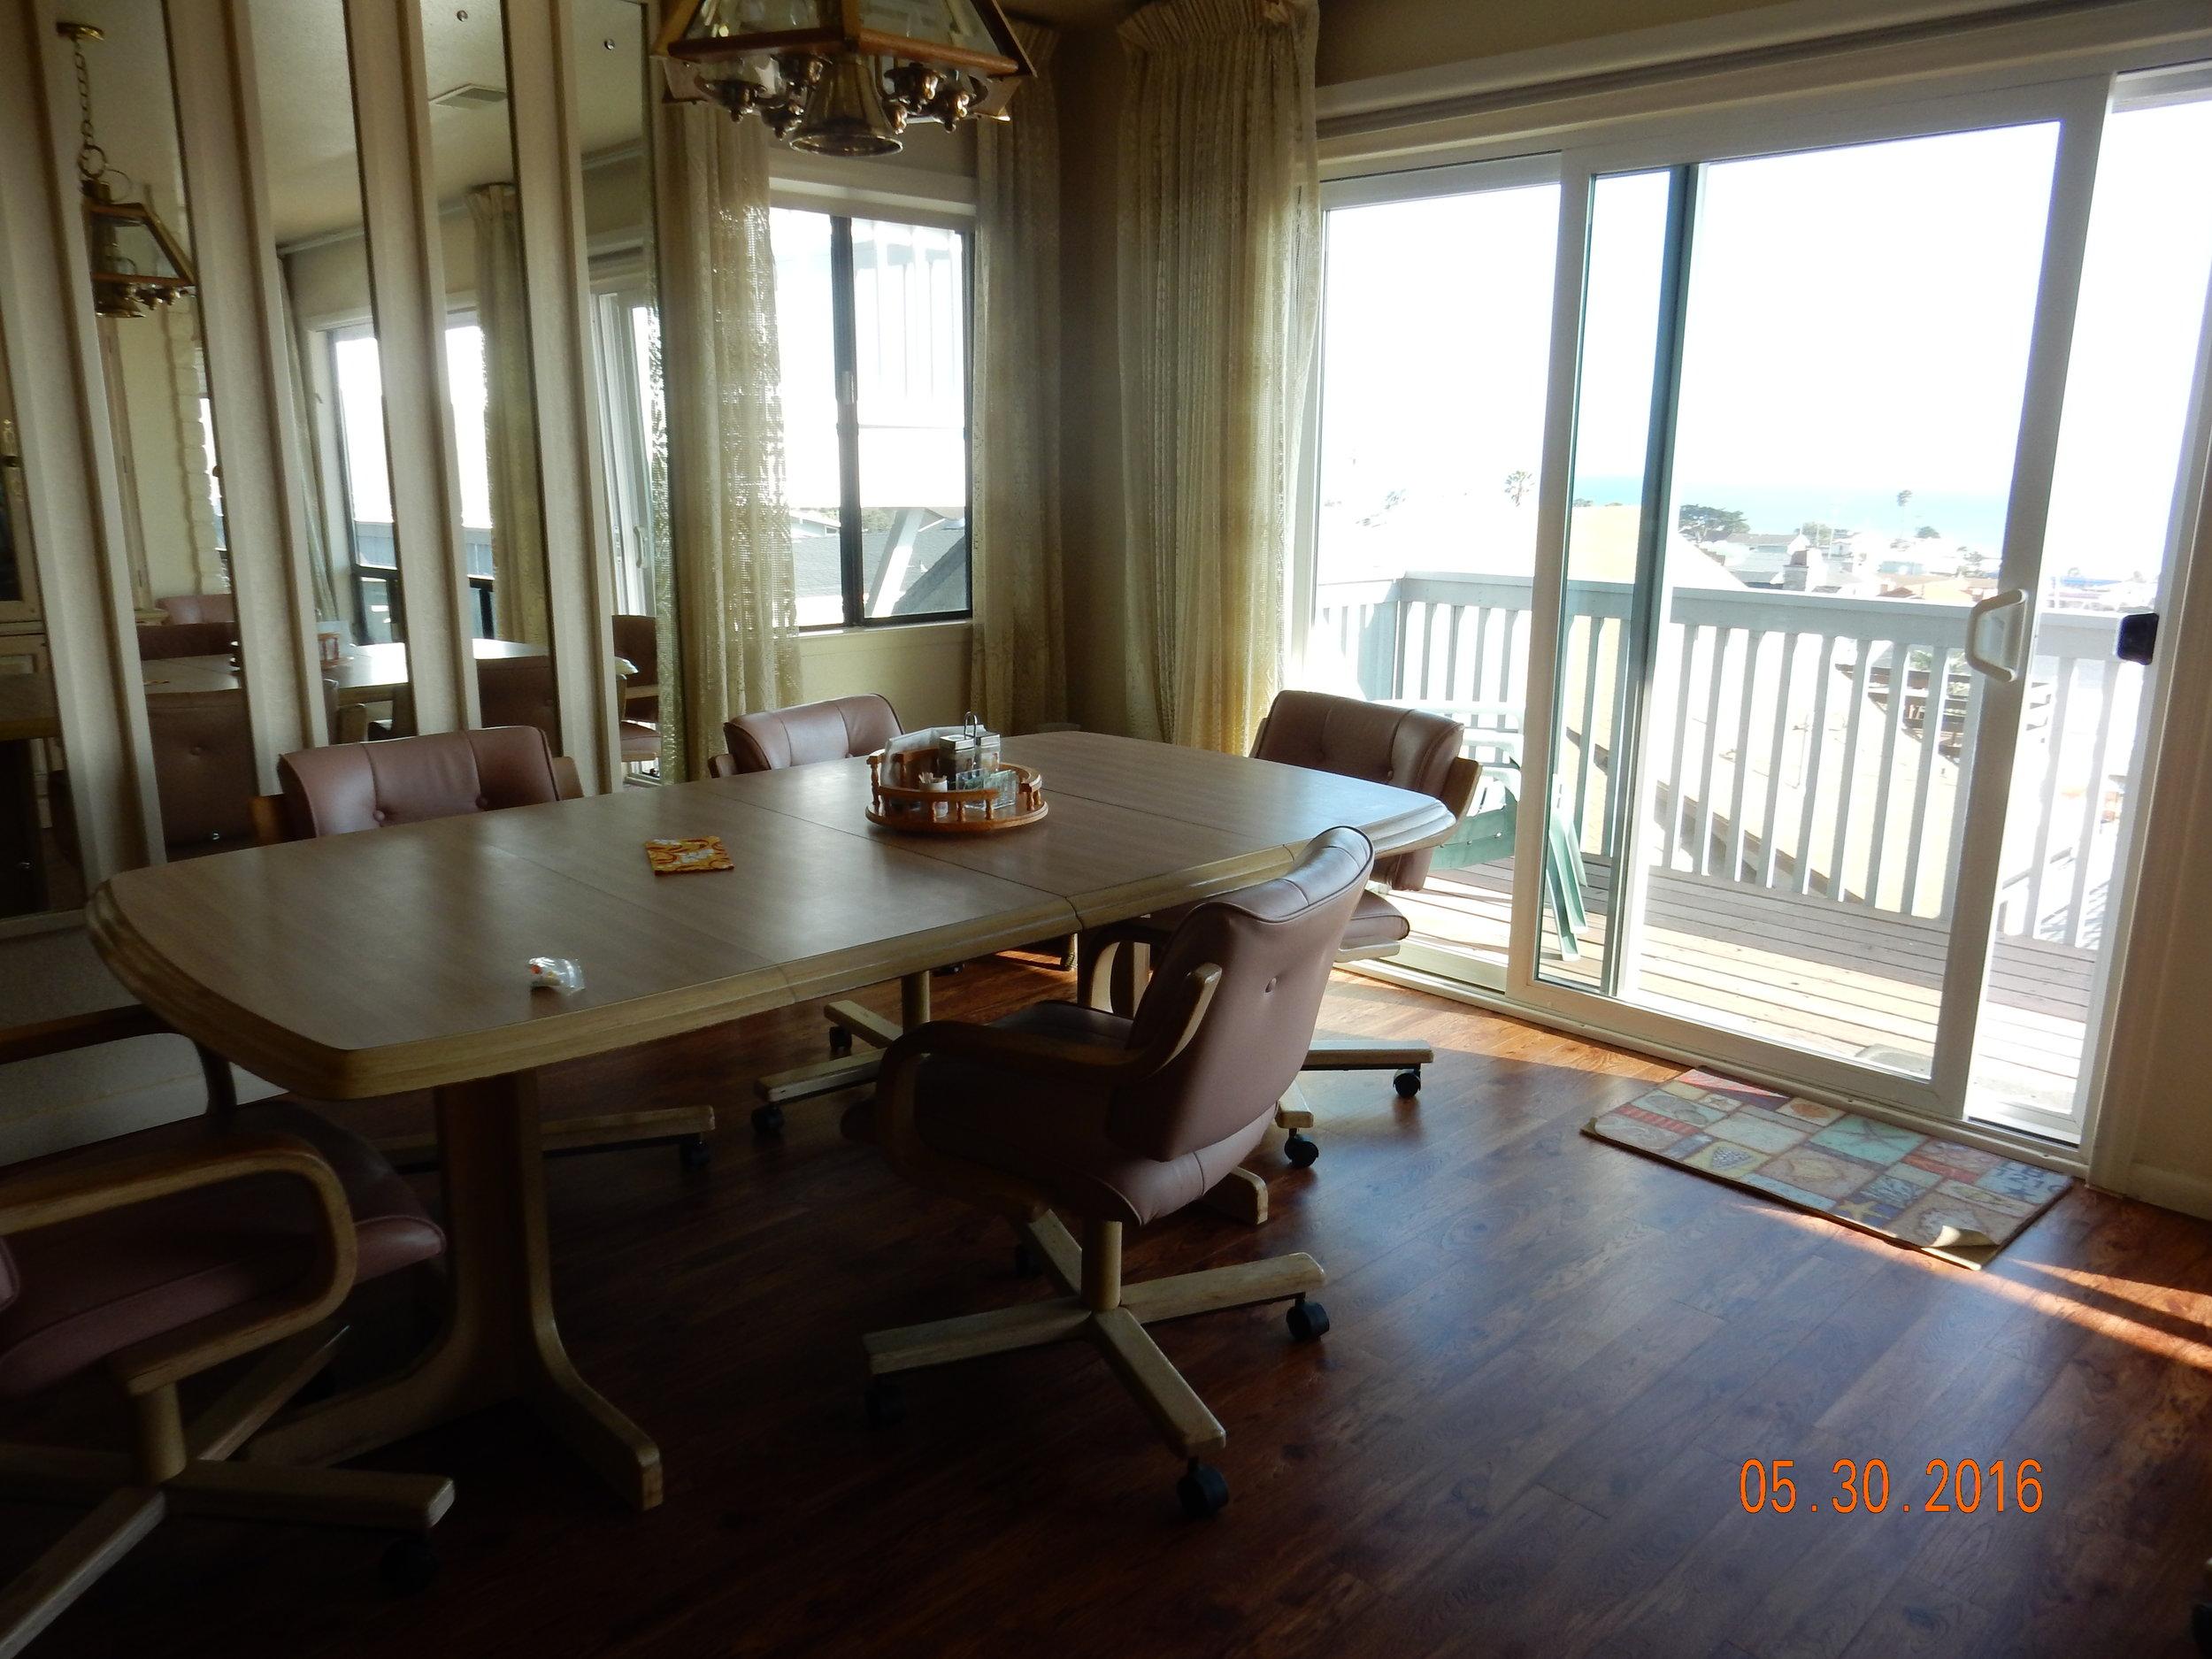 Dining_Table_1.JPG